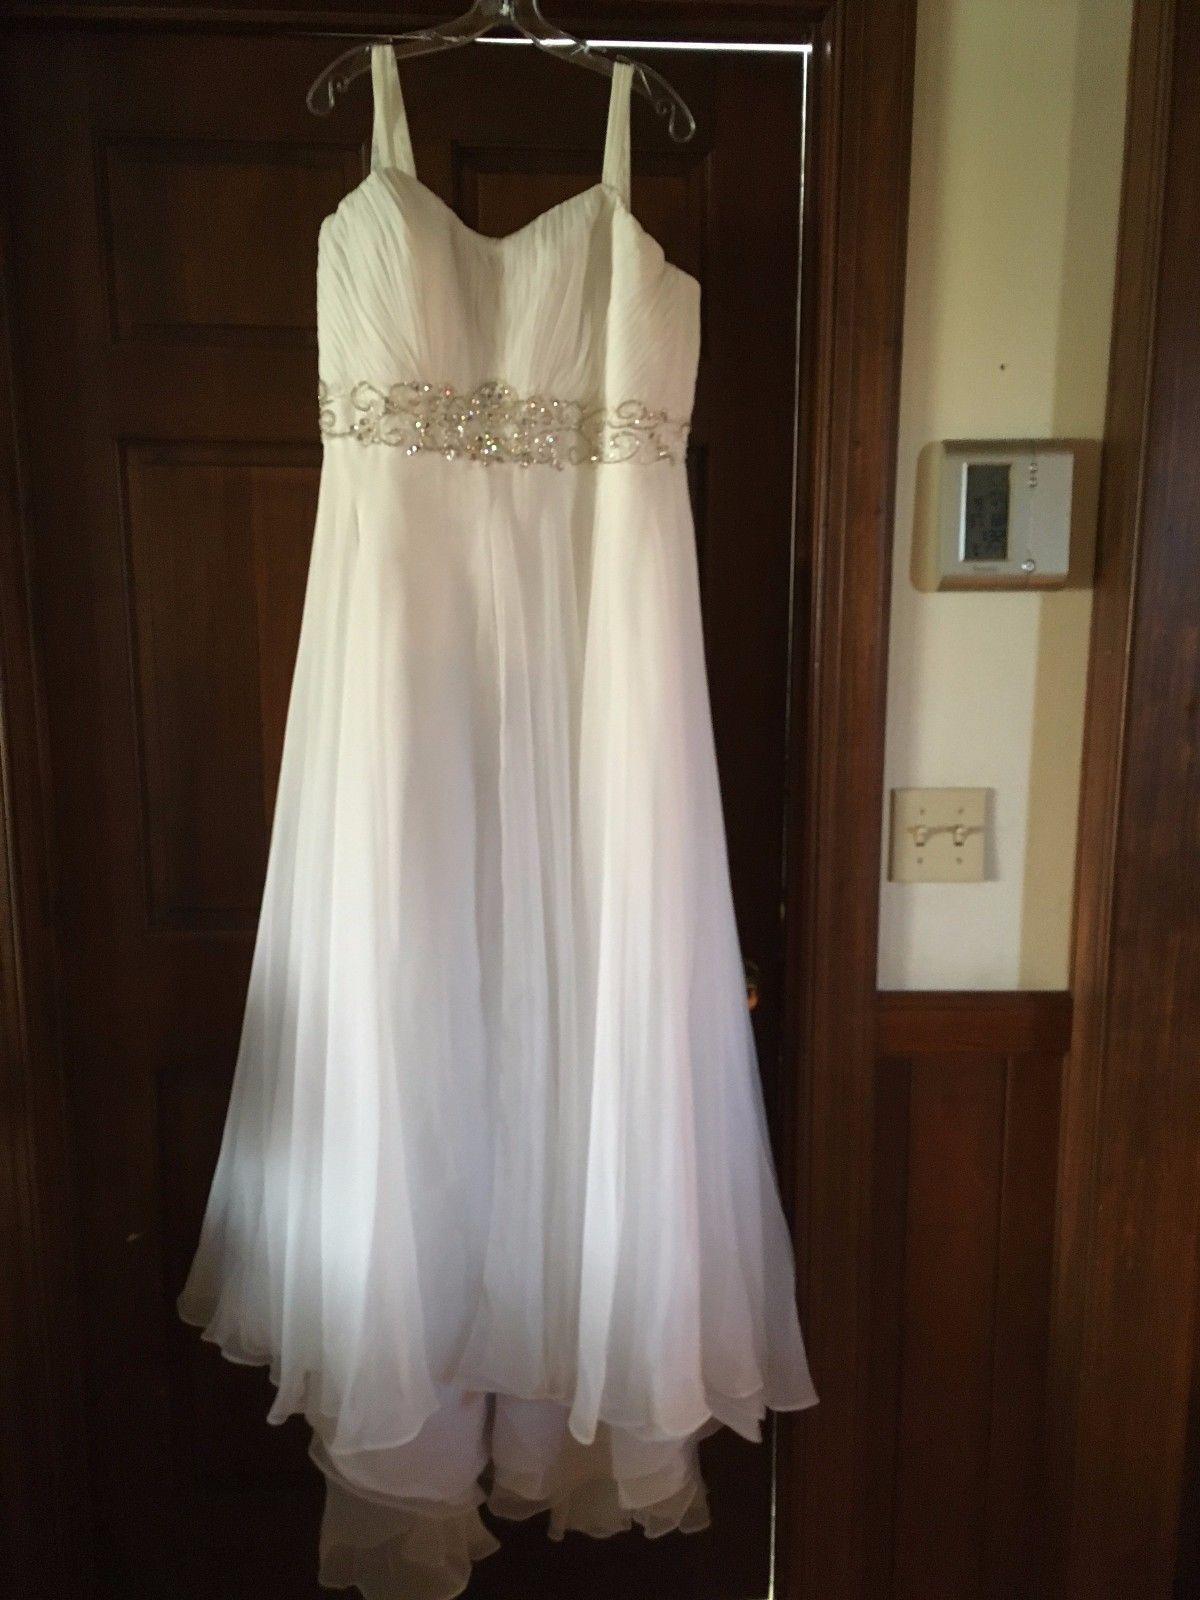 Size 24 wedding dress  Womenus wedding dress  worn once  Maryus Bridal plus size